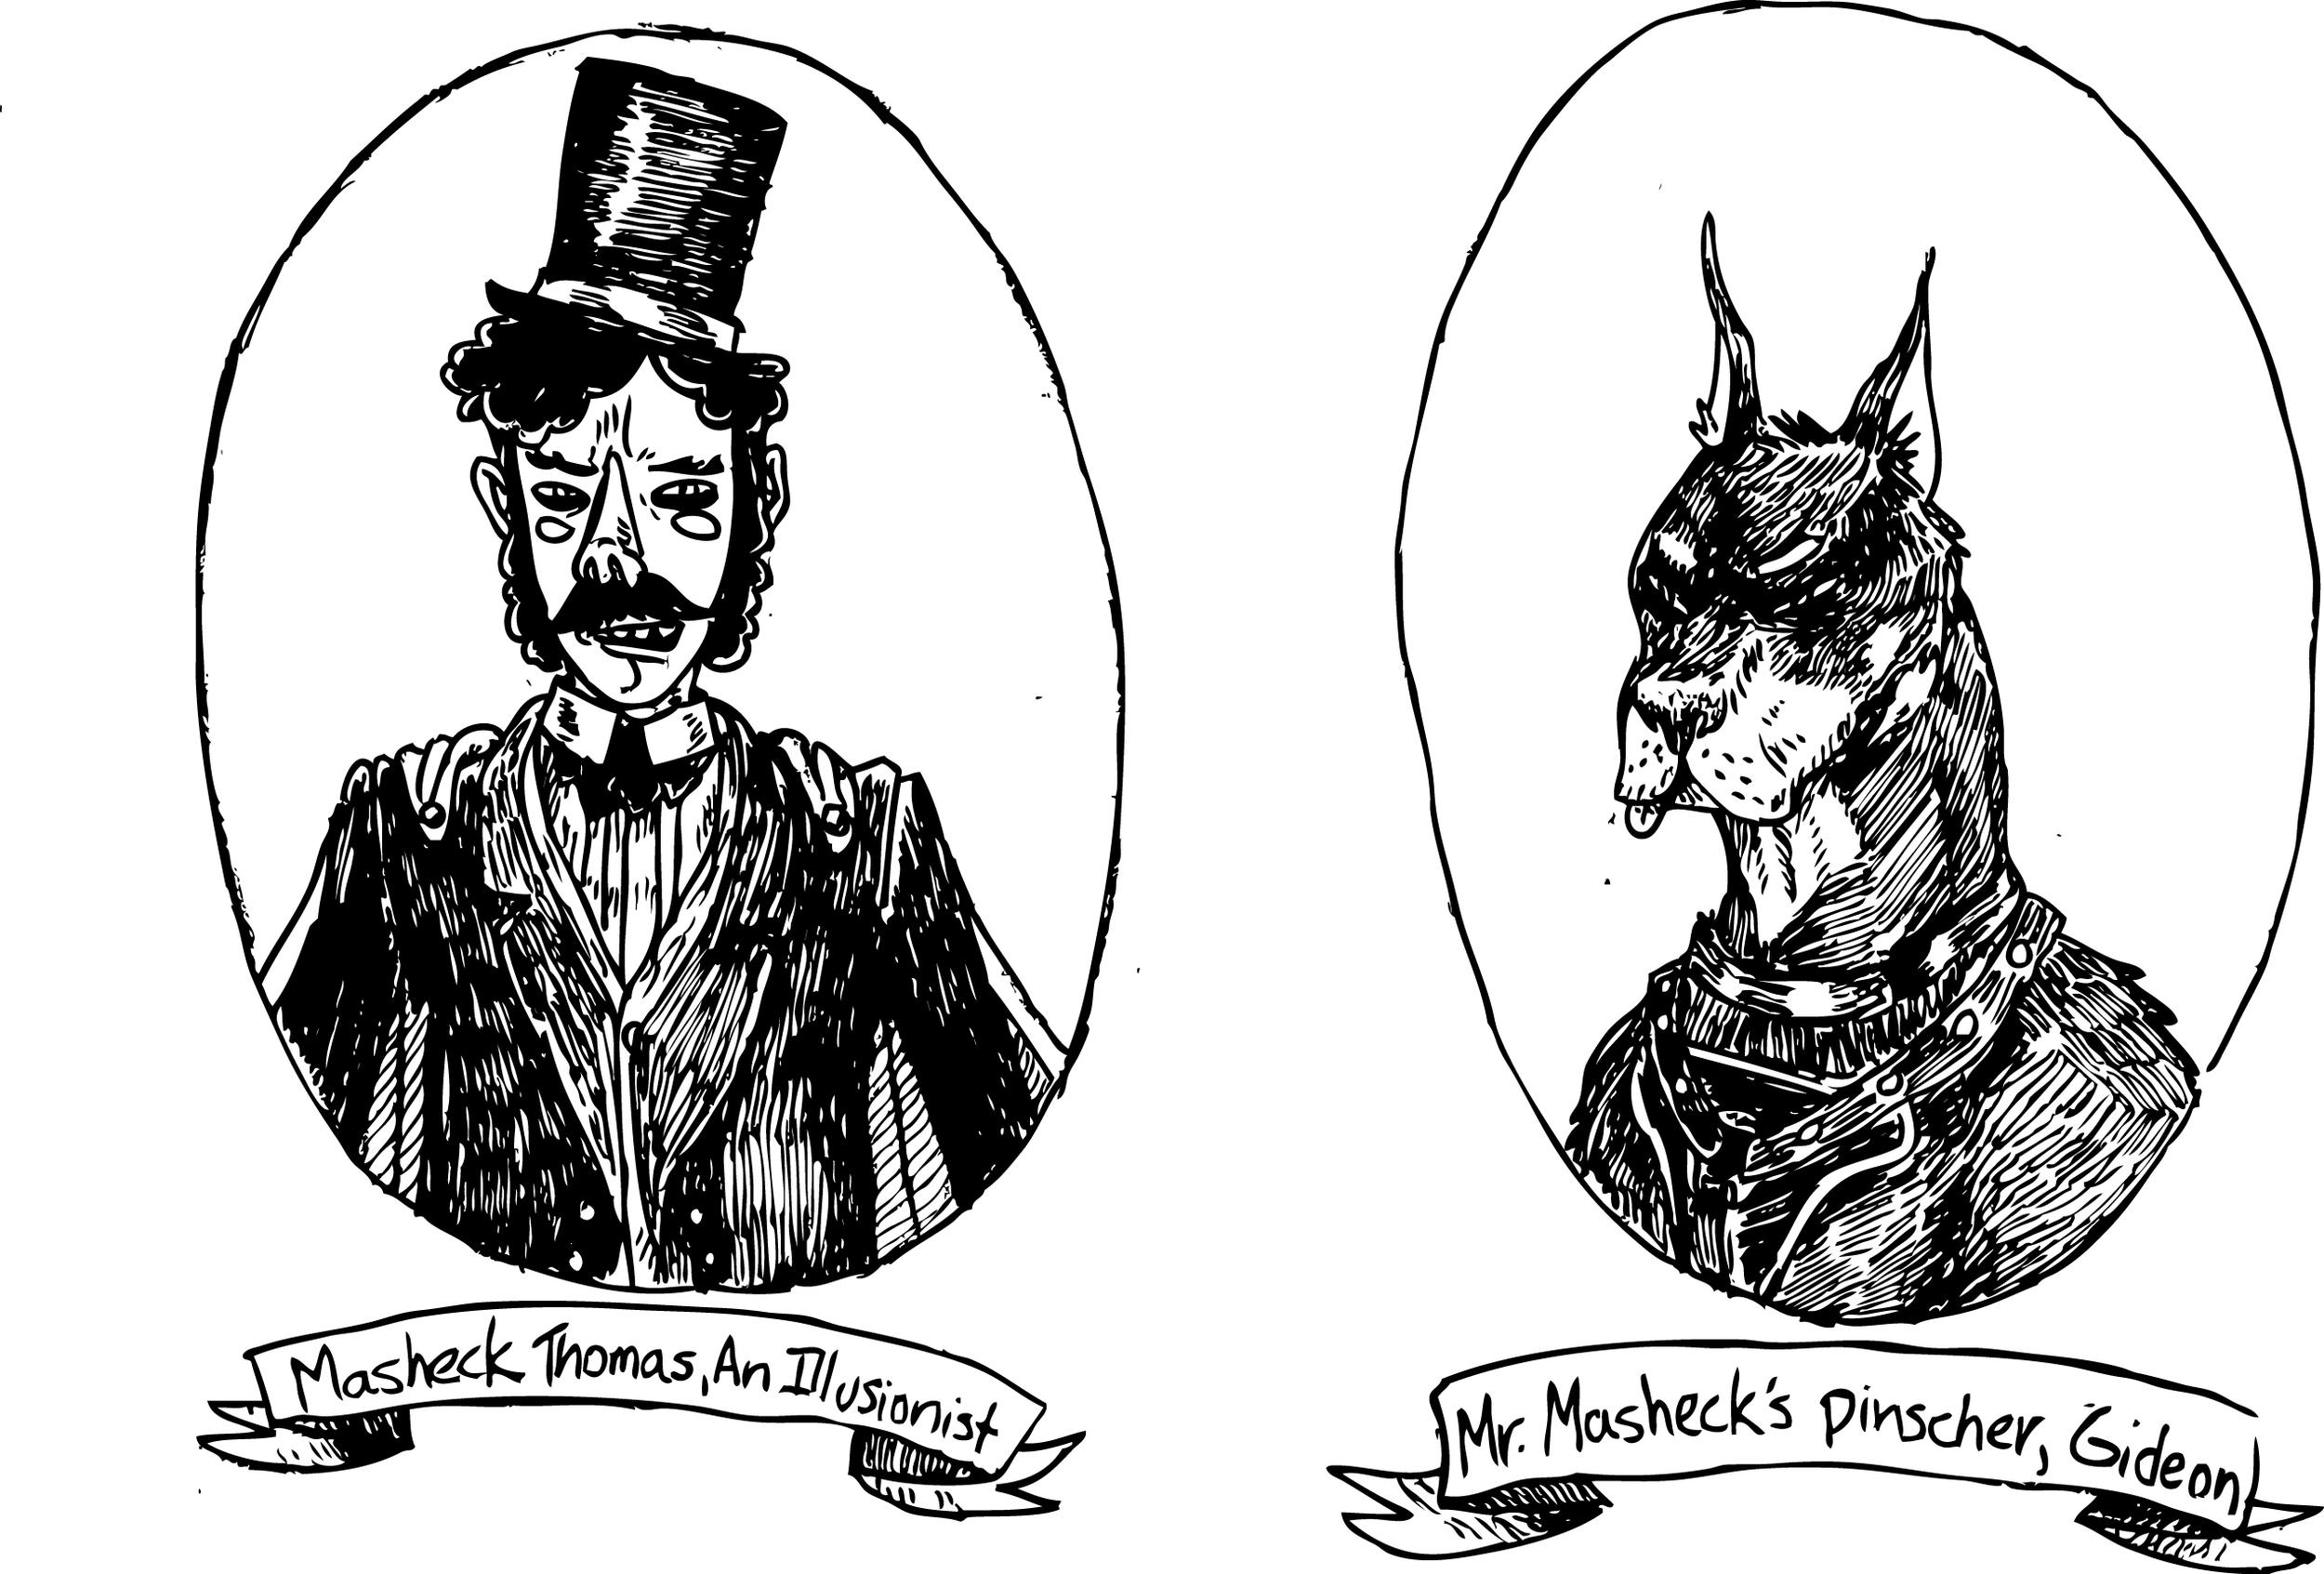 Mascheck the Illusionist